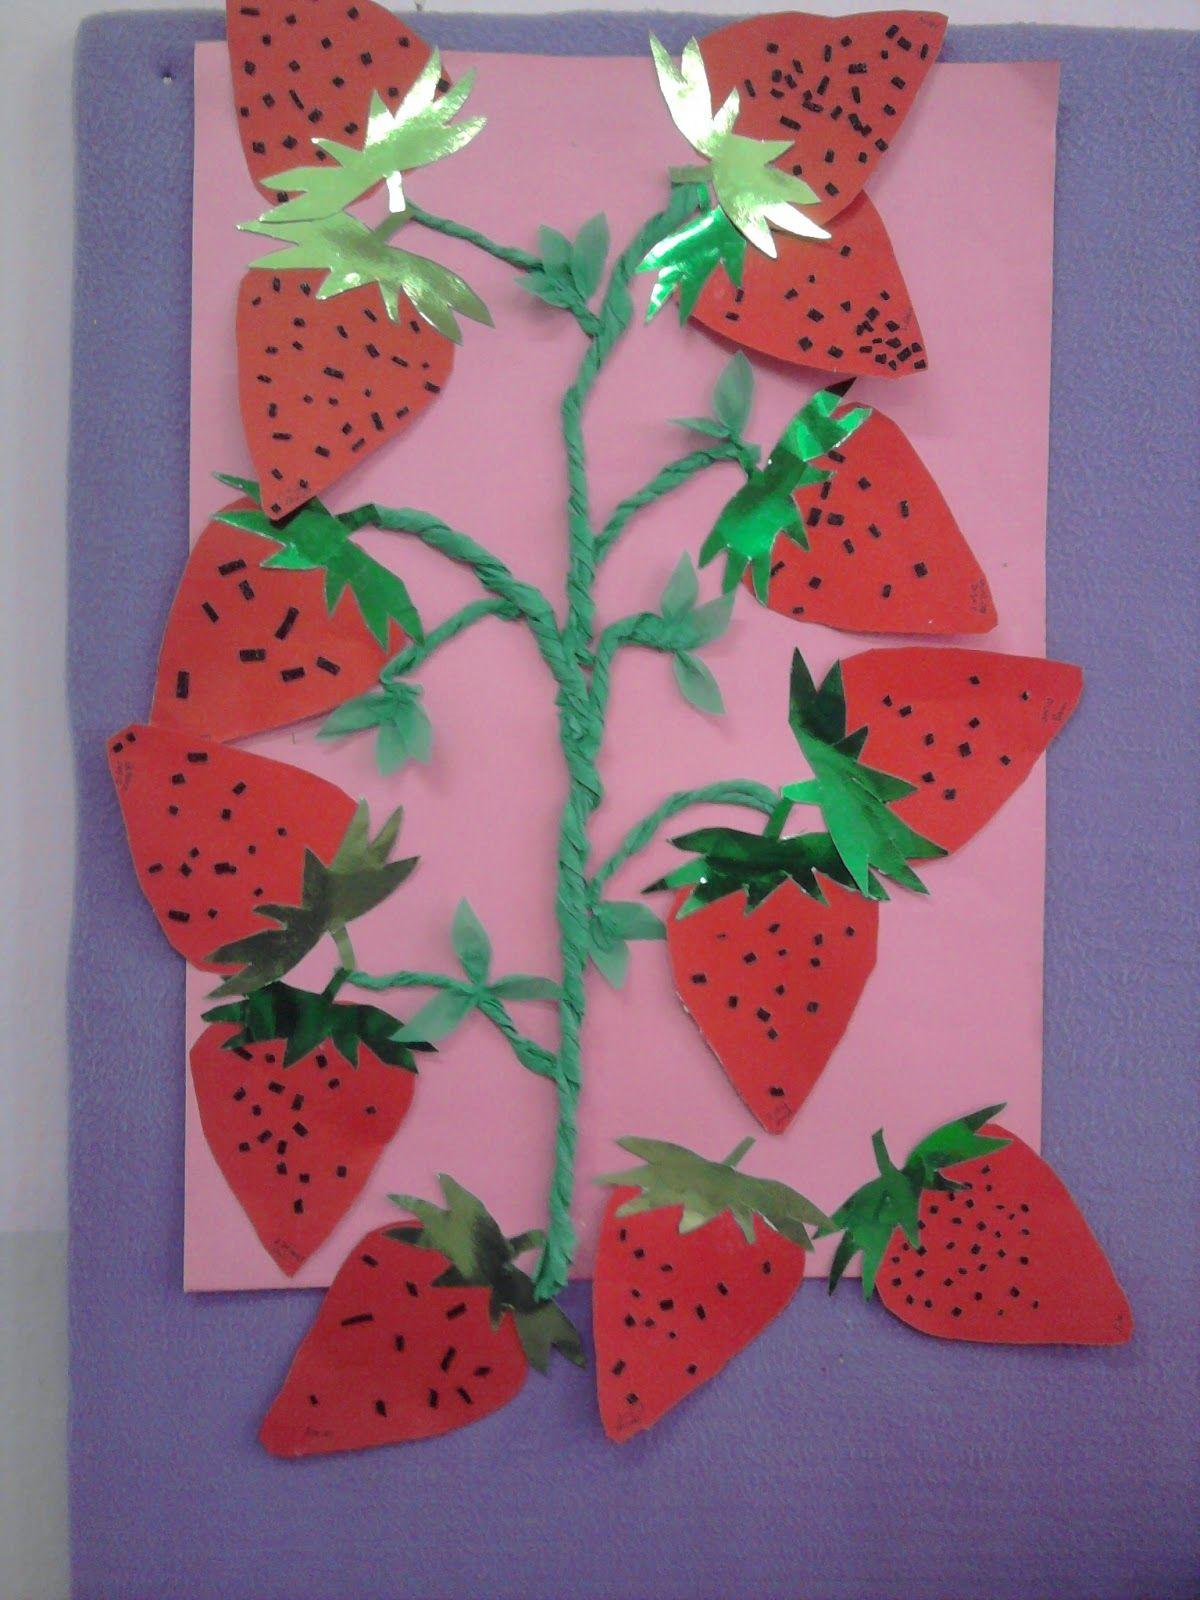 Strawberry Craft 2 Crafts And Worksheets For Preschool Toddler And Kindergarten Strawberry Crafts Fruit Crafts Daycare Crafts [ 1600 x 1200 Pixel ]